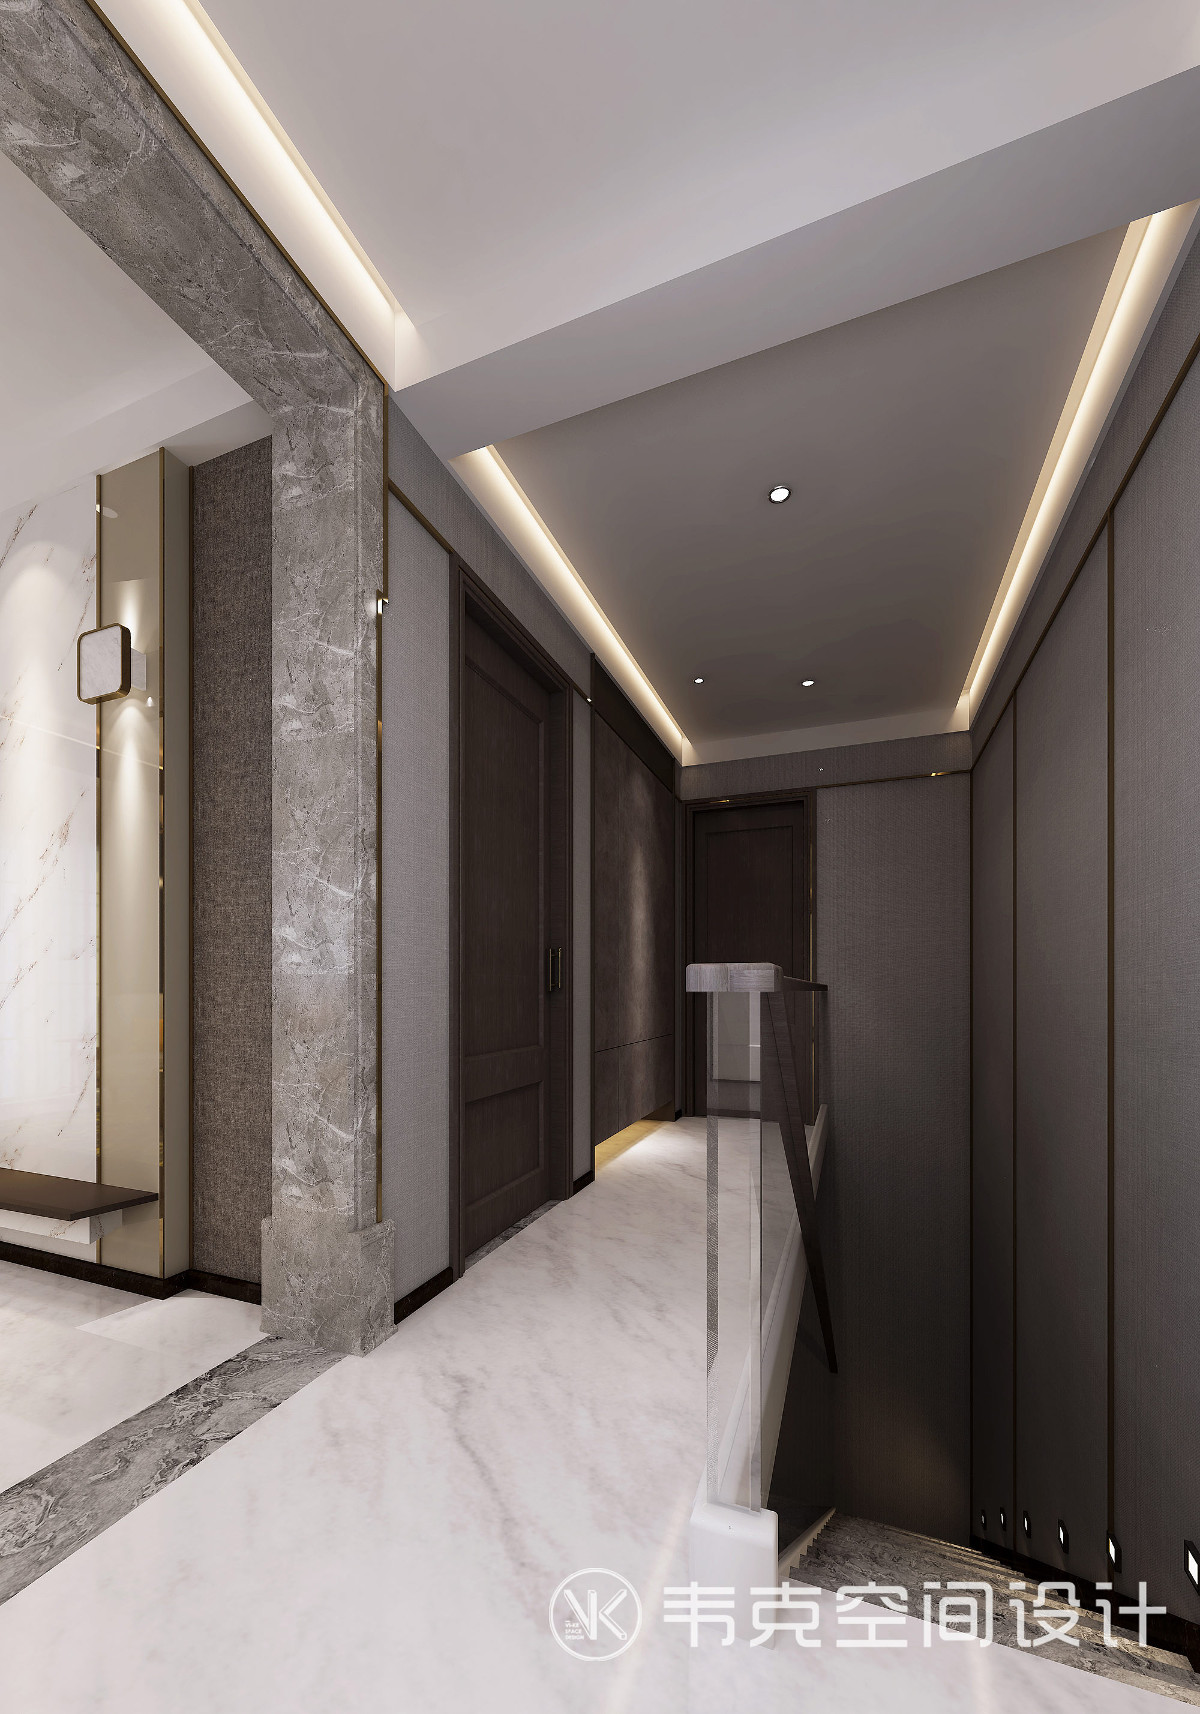 L型过道几乎连通了家里的全部主要功能区,给人一种曲径通幽的感觉,充满东方意境和气质,一种静谧的空间在尘嚣中觅一方净土。